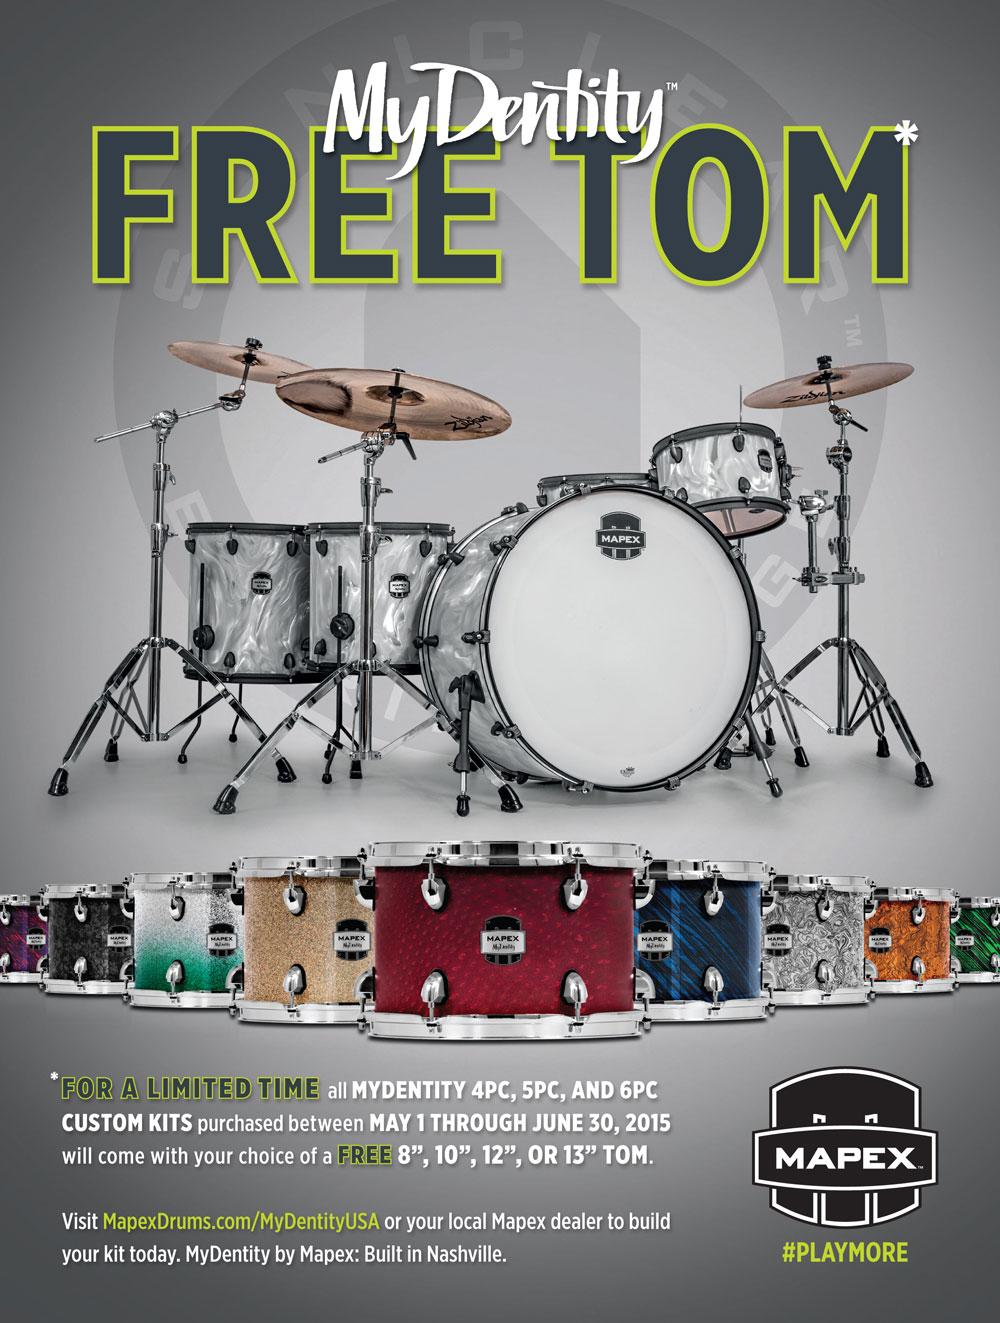 Mapex MyDentity Free Tom Event